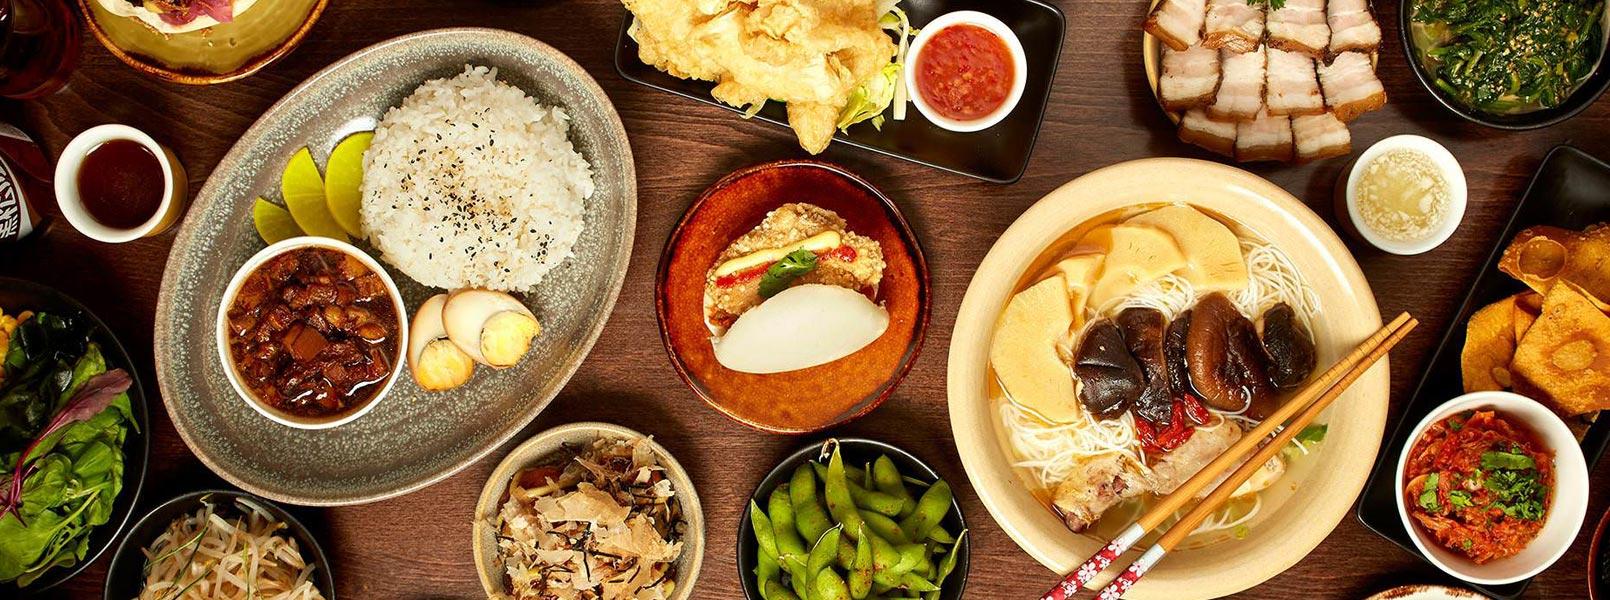 Food_W.jpg